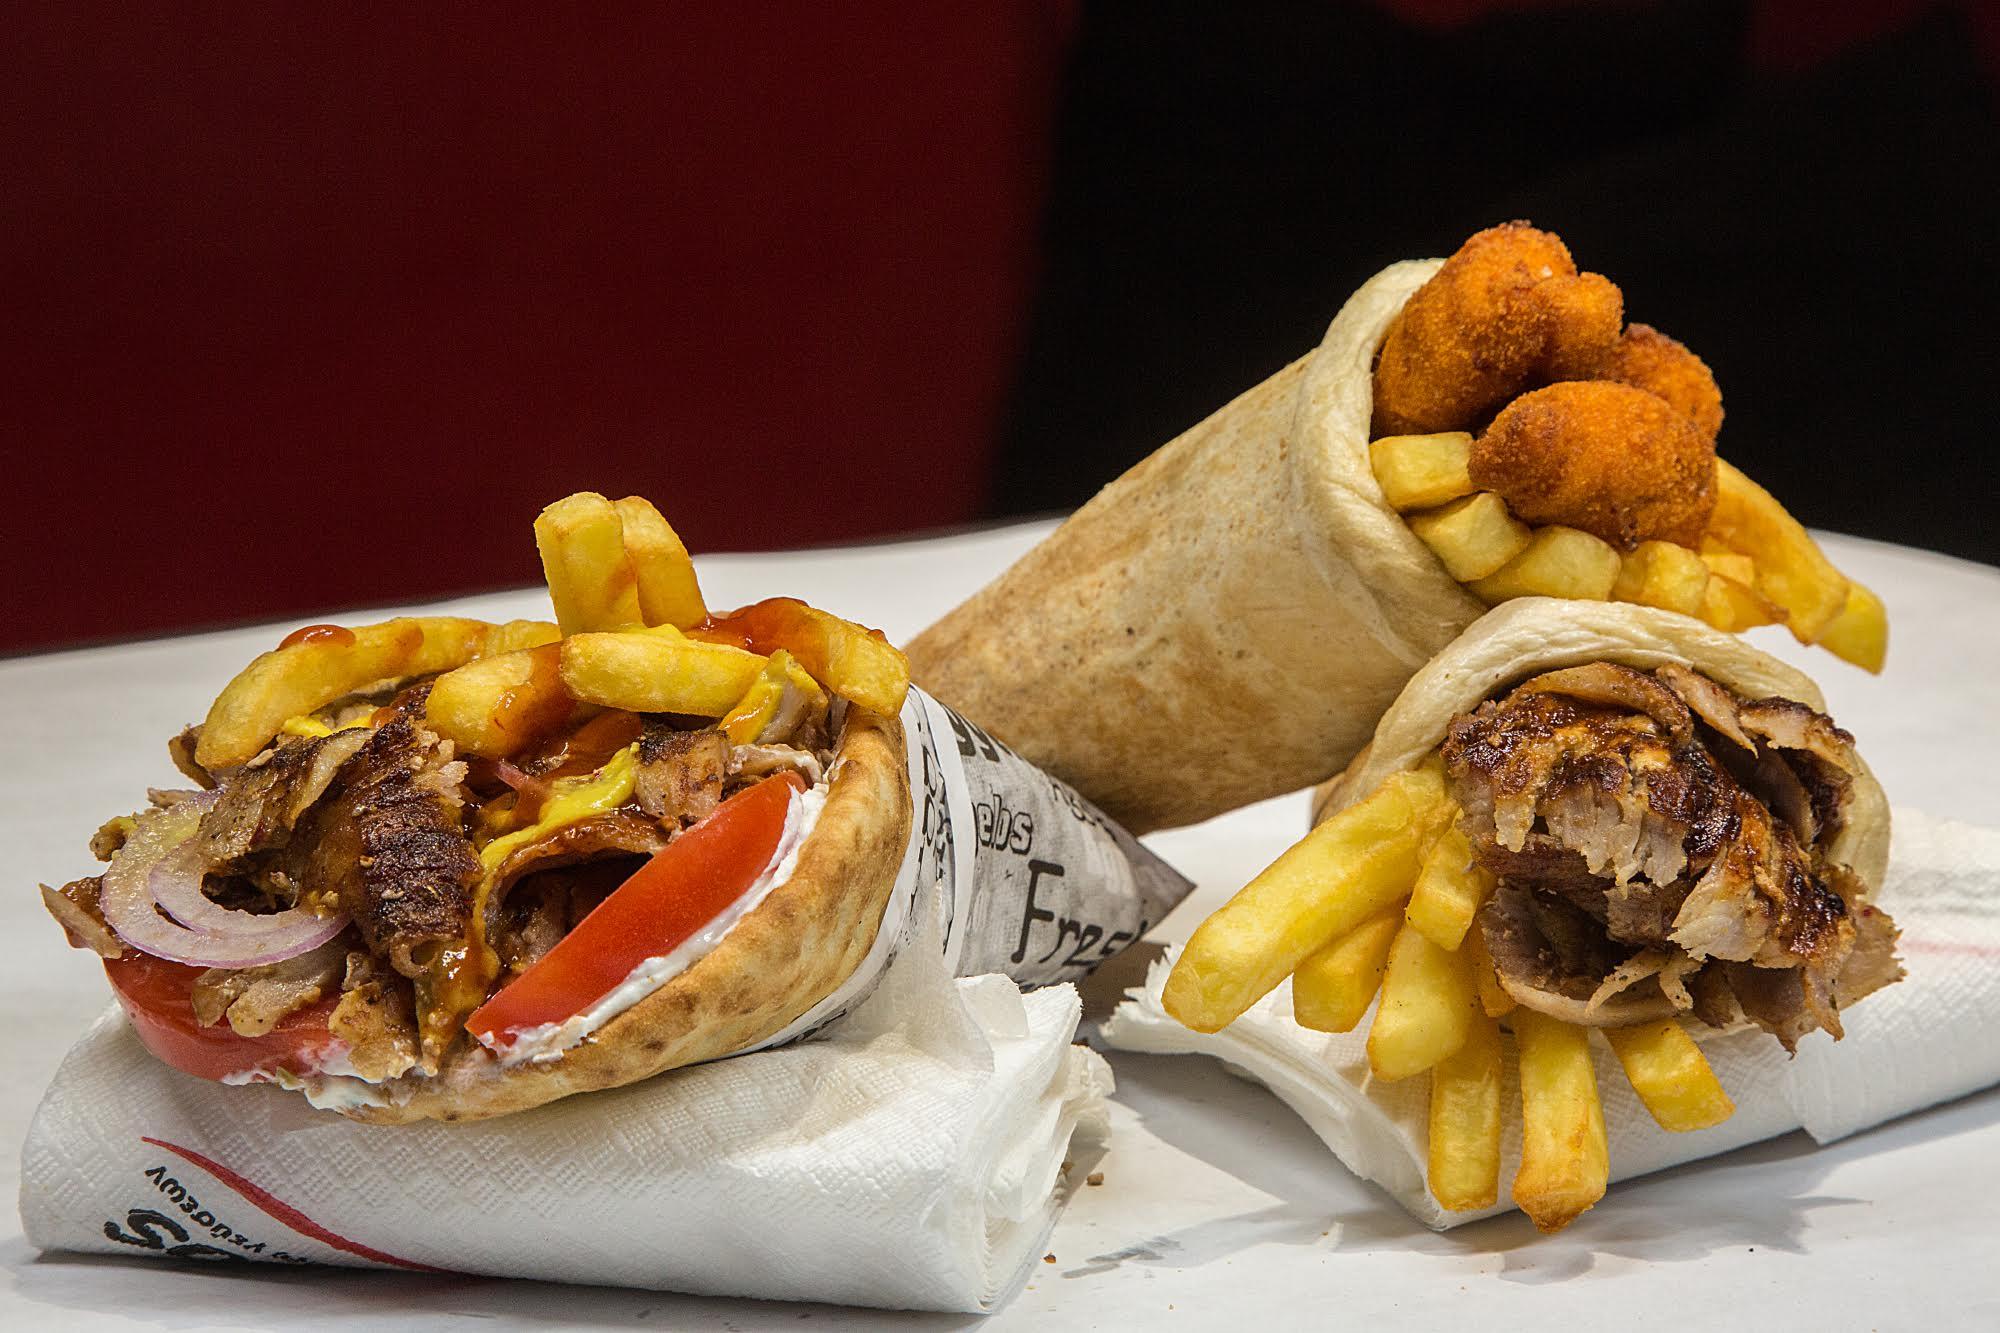 aggelos1 - Φοιτητής στη Λάρισα και πείνασες; Να από που θα παραγγείλεις!